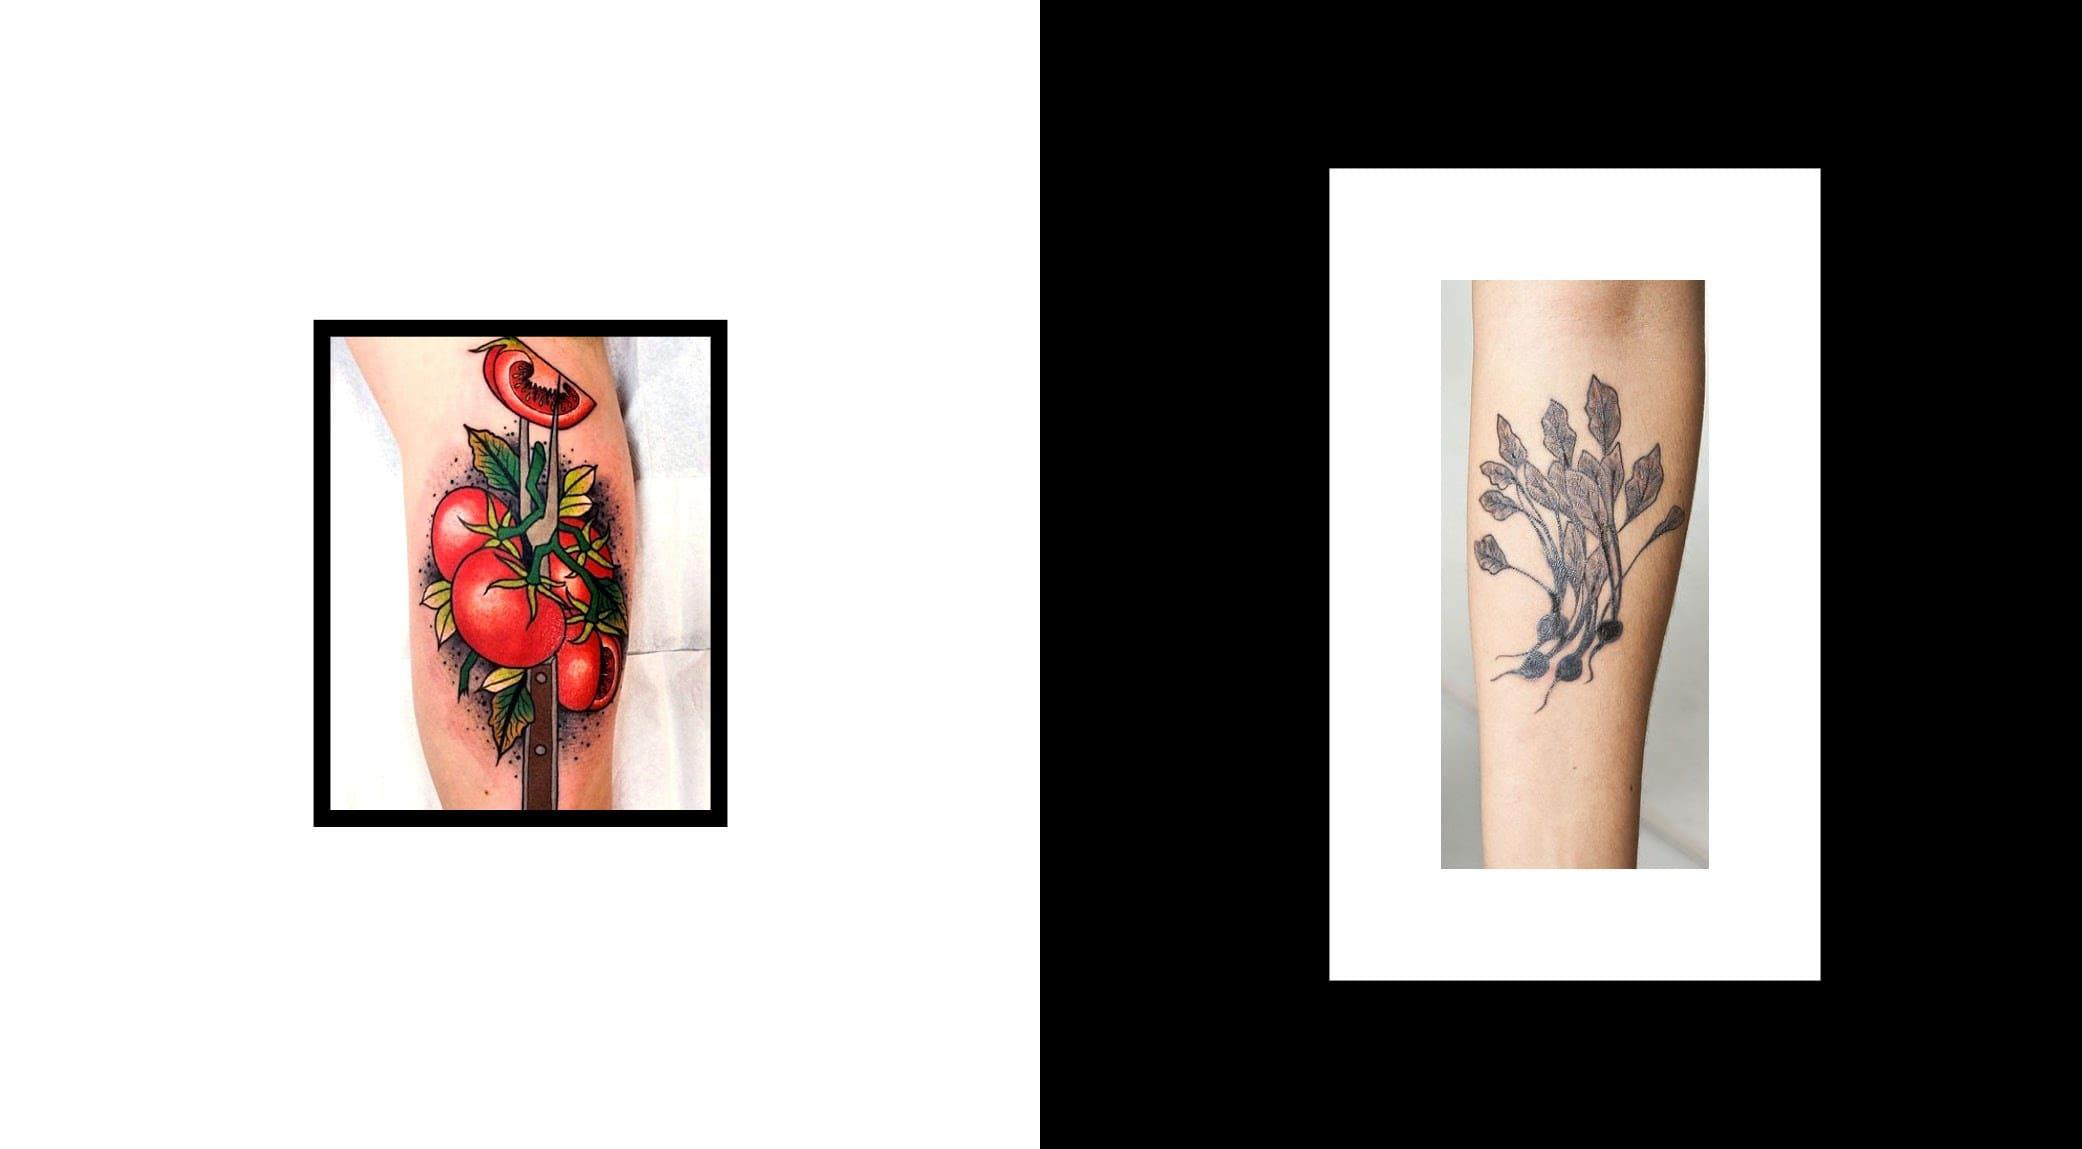 original_011-tattoo-finedininglovers11.jpg